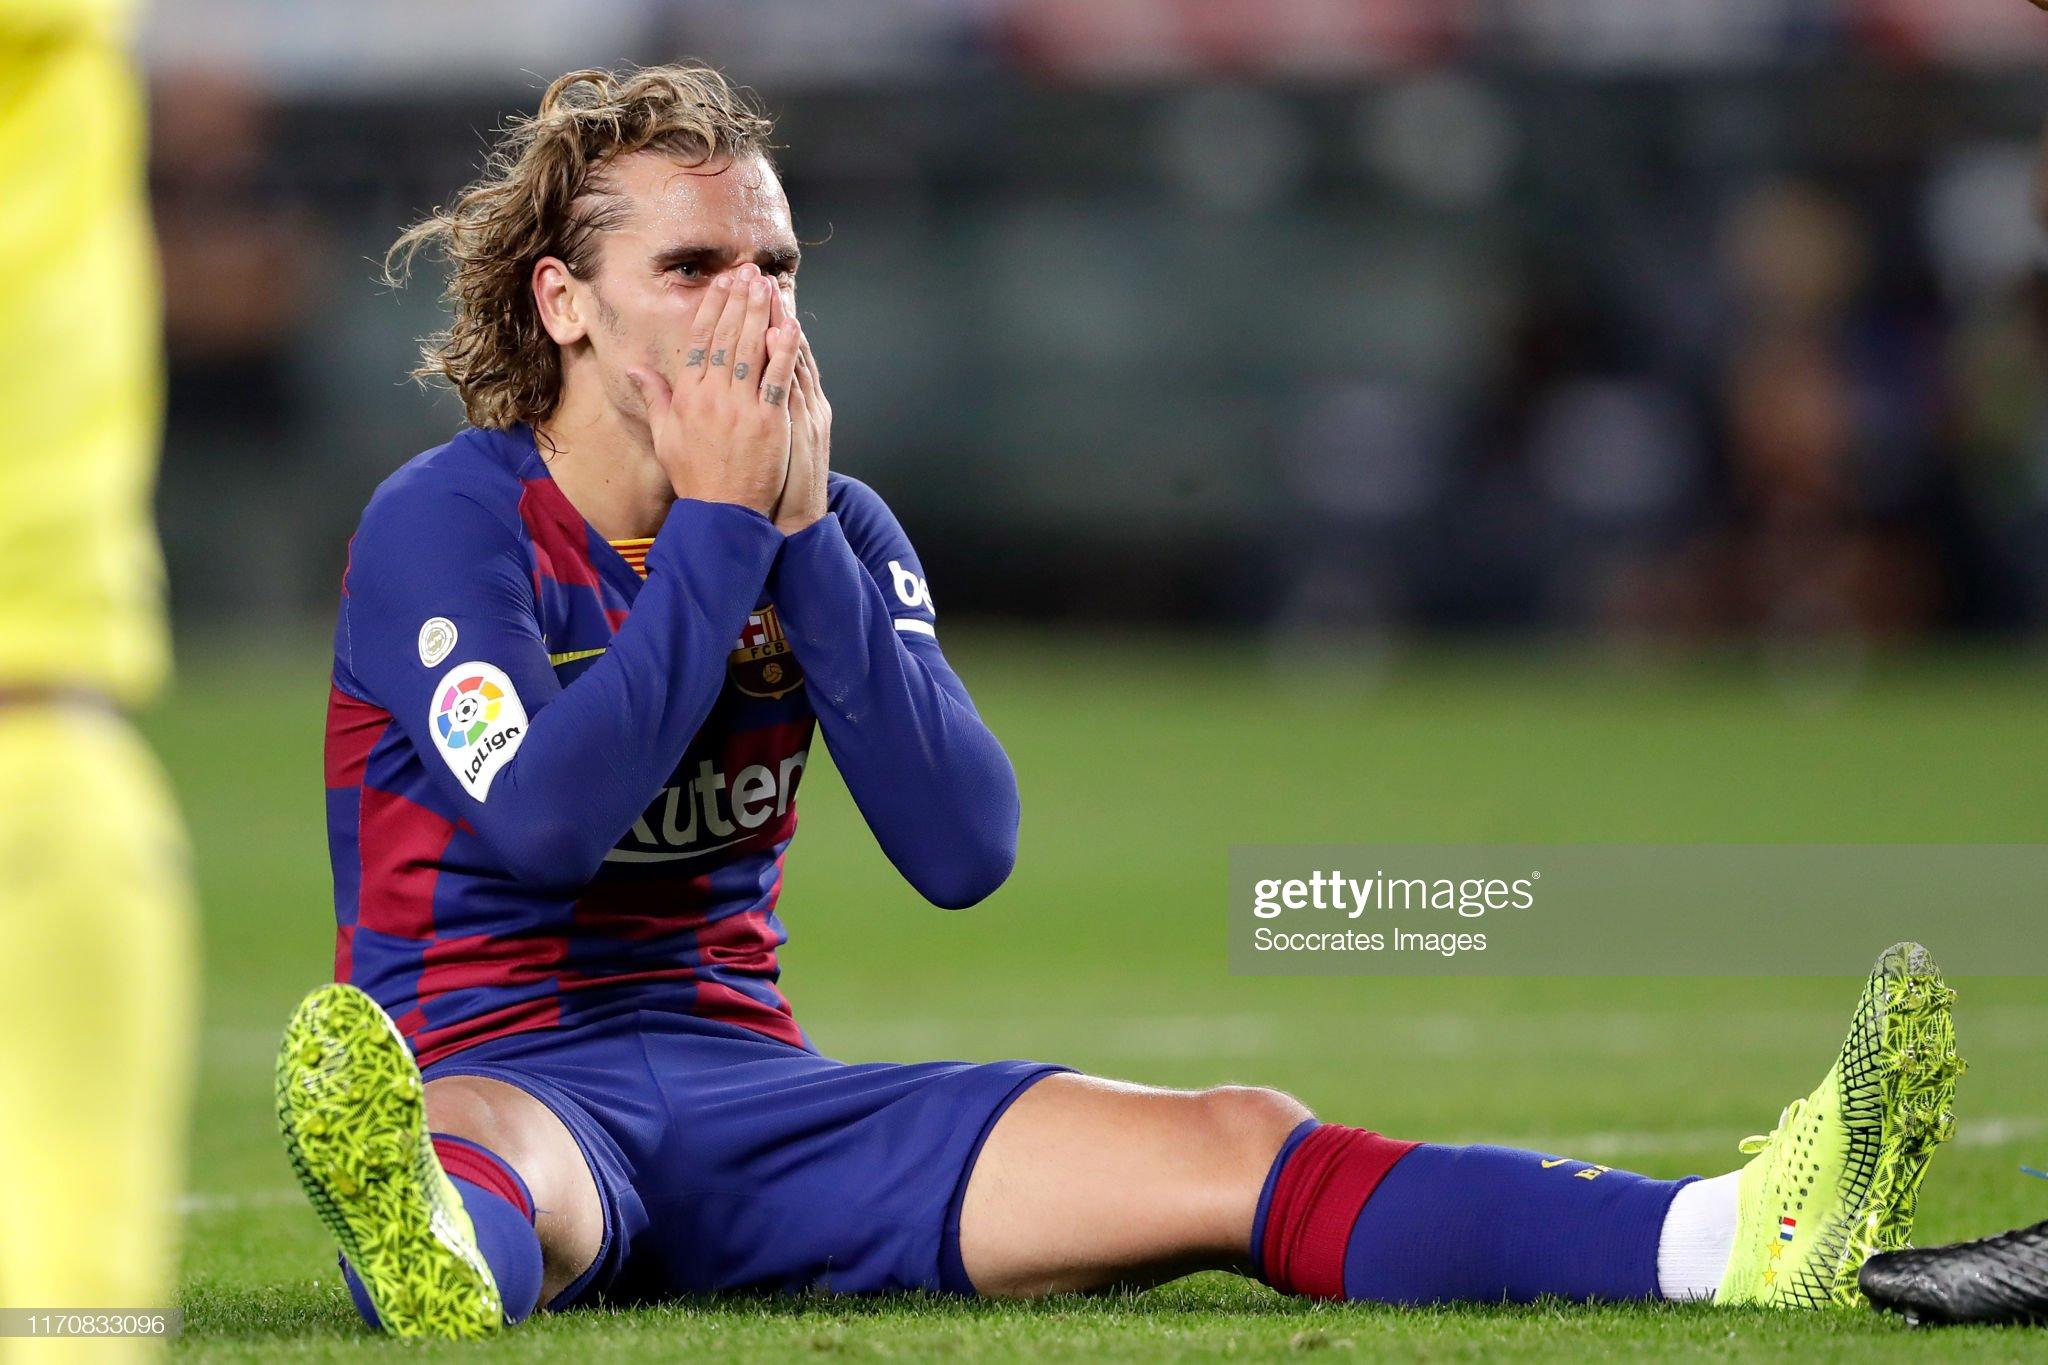 صور مباراة : برشلونة - فياريال 2-1 ( 24-09-2019 )  Antoine-griezmann-of-fc-barcelona-during-the-la-liga-santander-match-picture-id1170833096?s=2048x2048